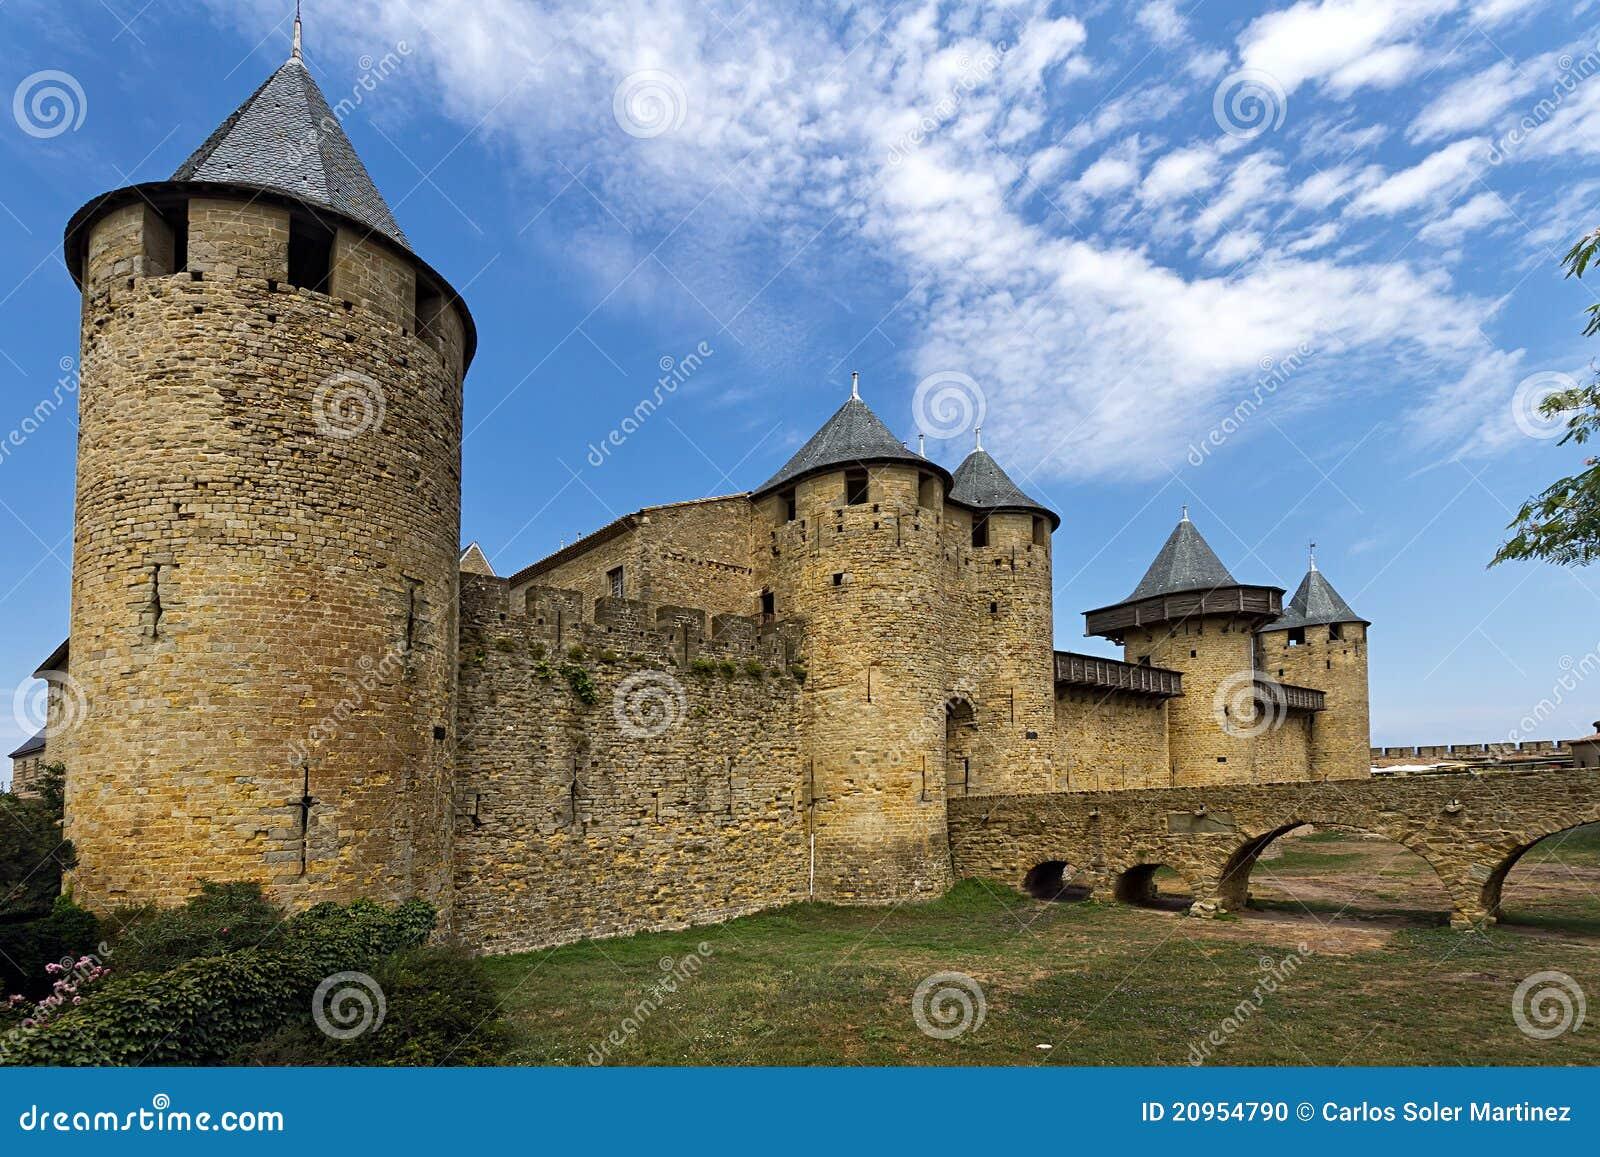 carcassonne france unesco castle stock photo image 20954790. Black Bedroom Furniture Sets. Home Design Ideas